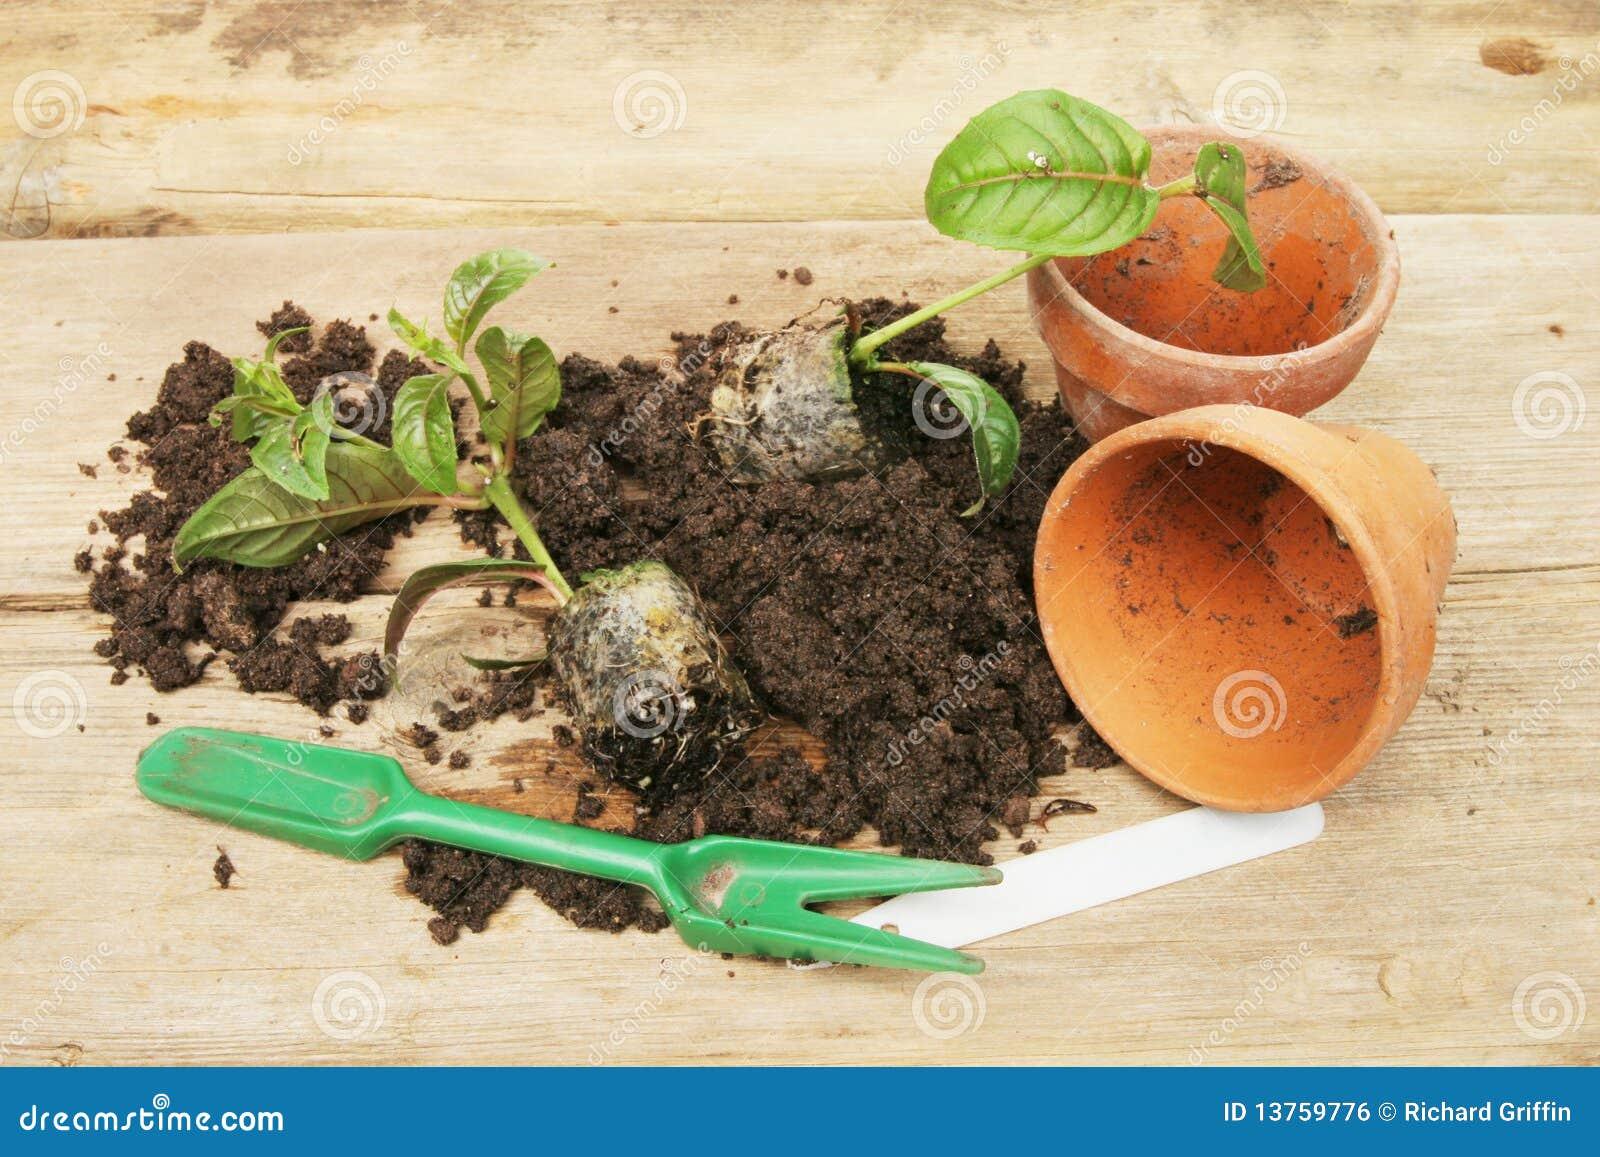 Potting on plants